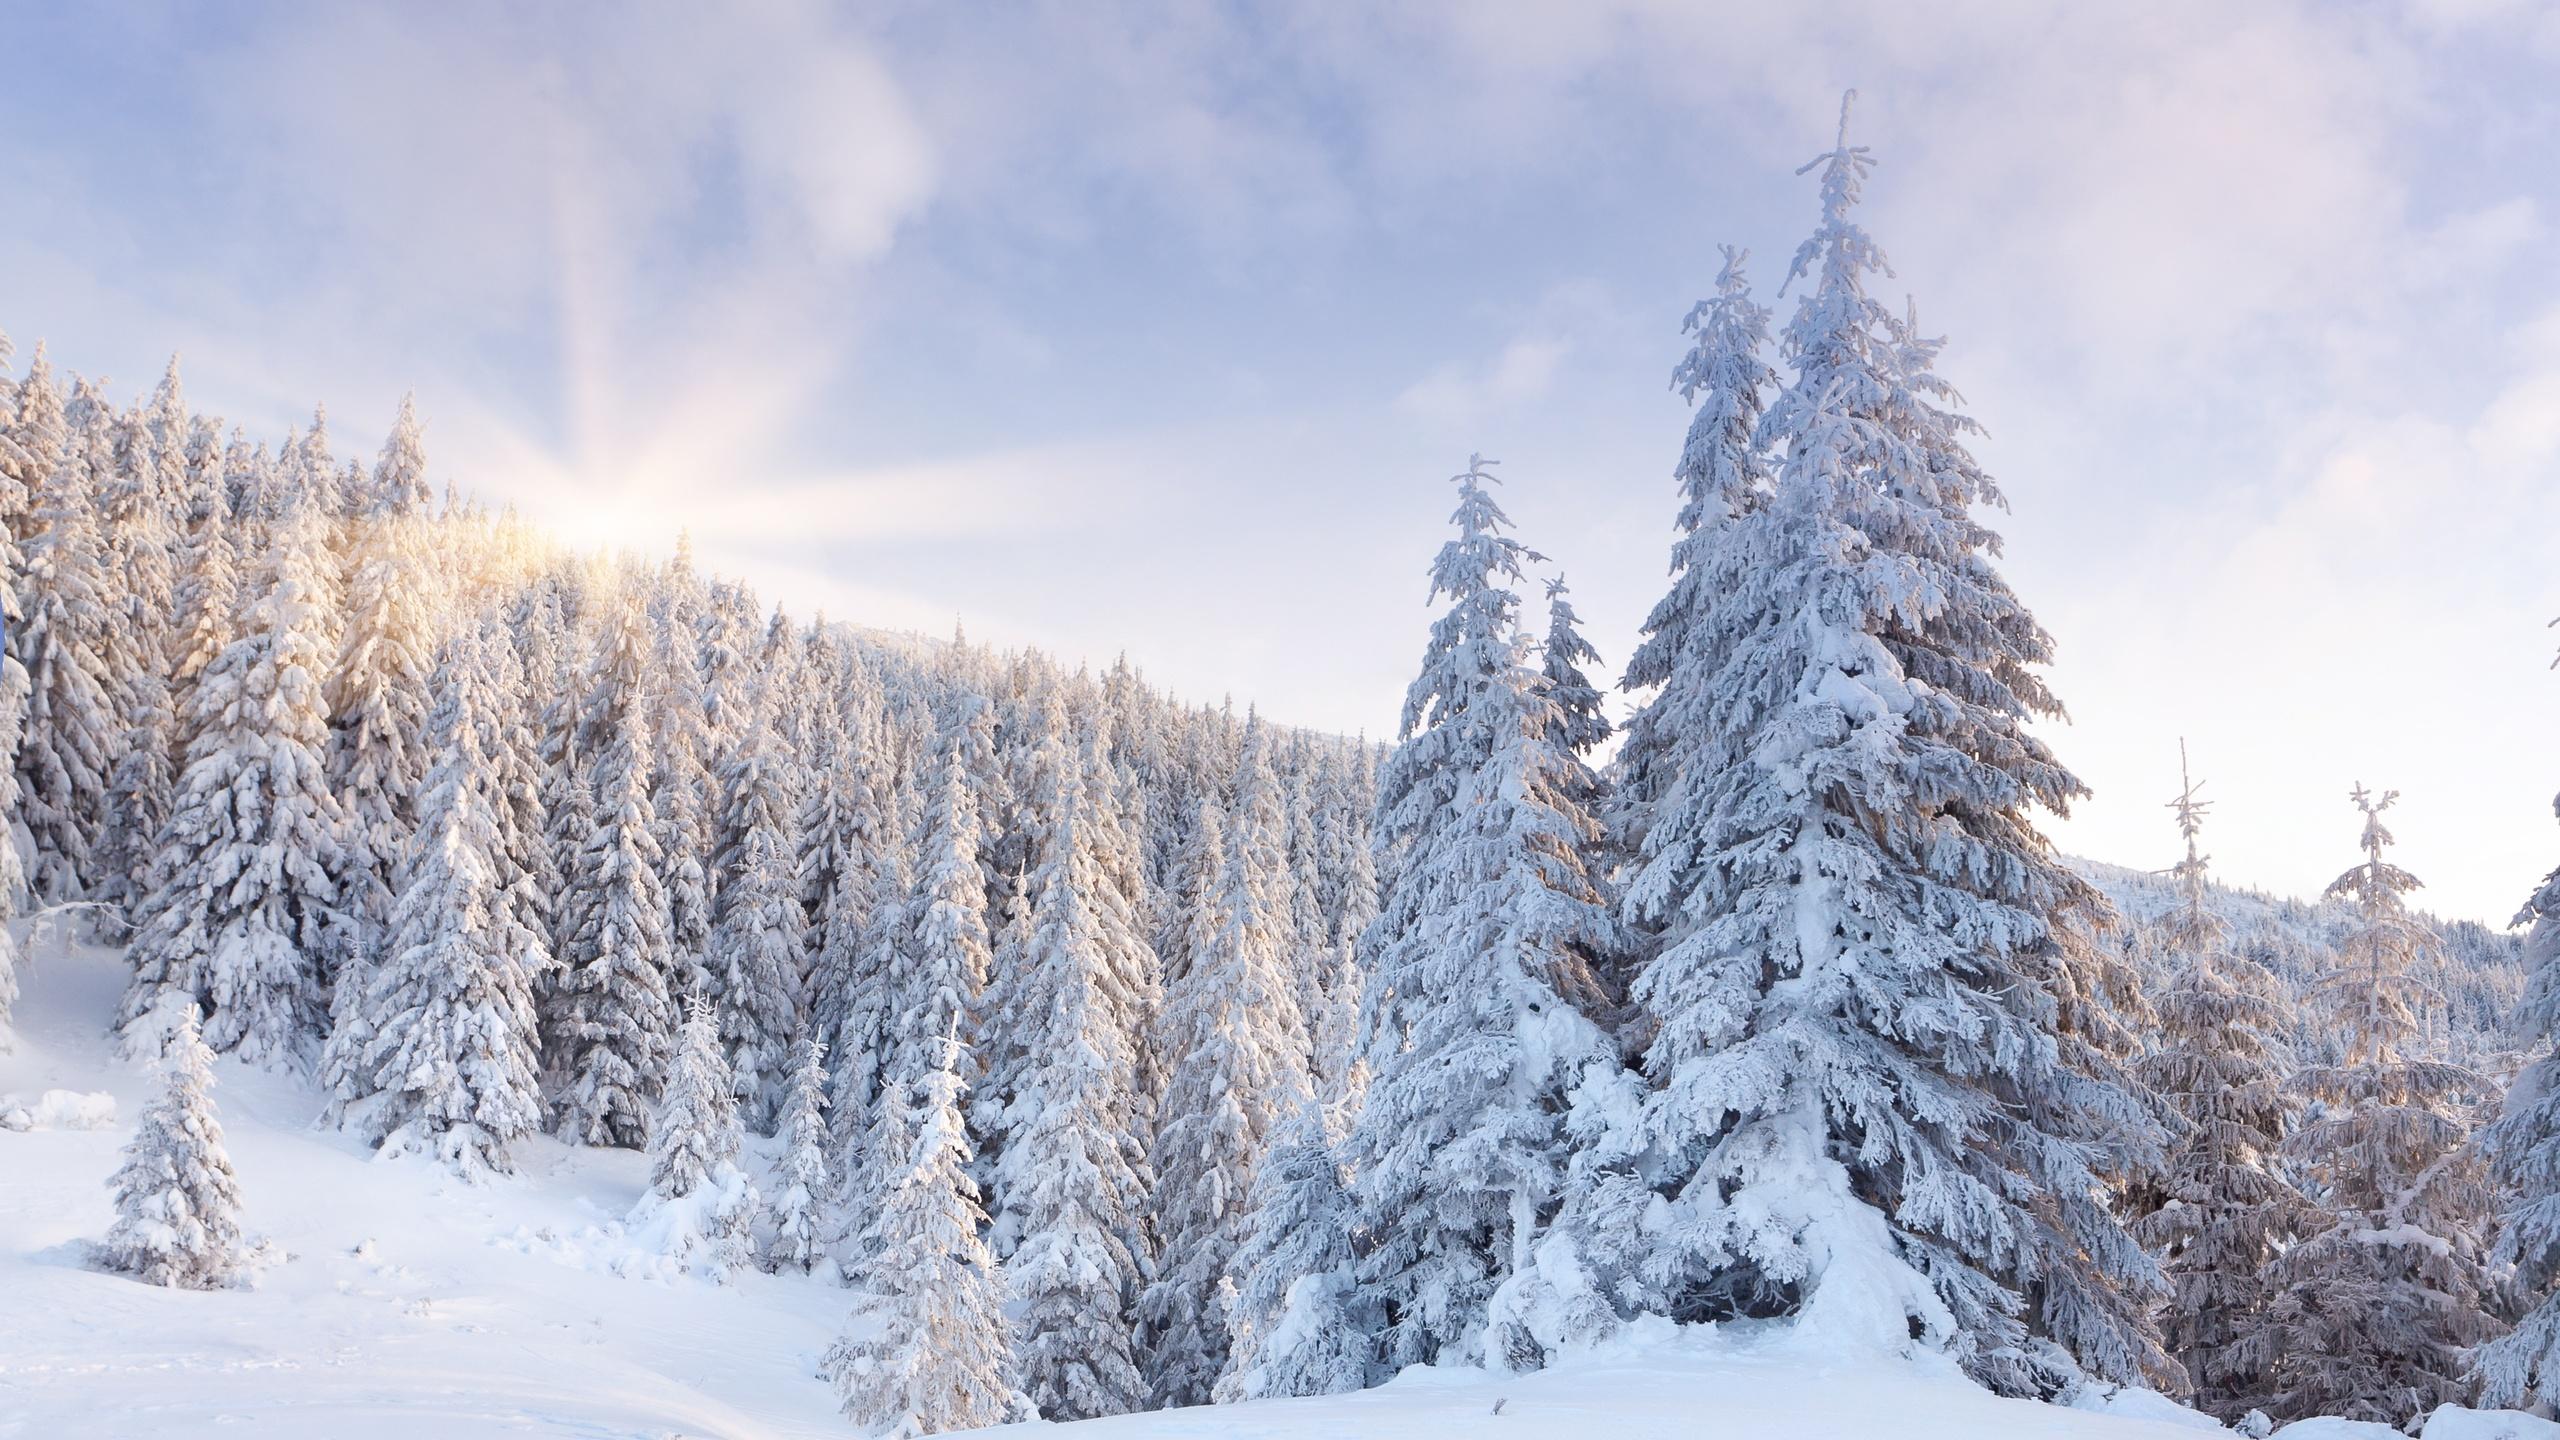 зима, лес, рассвет, ёлки, снег, солнце